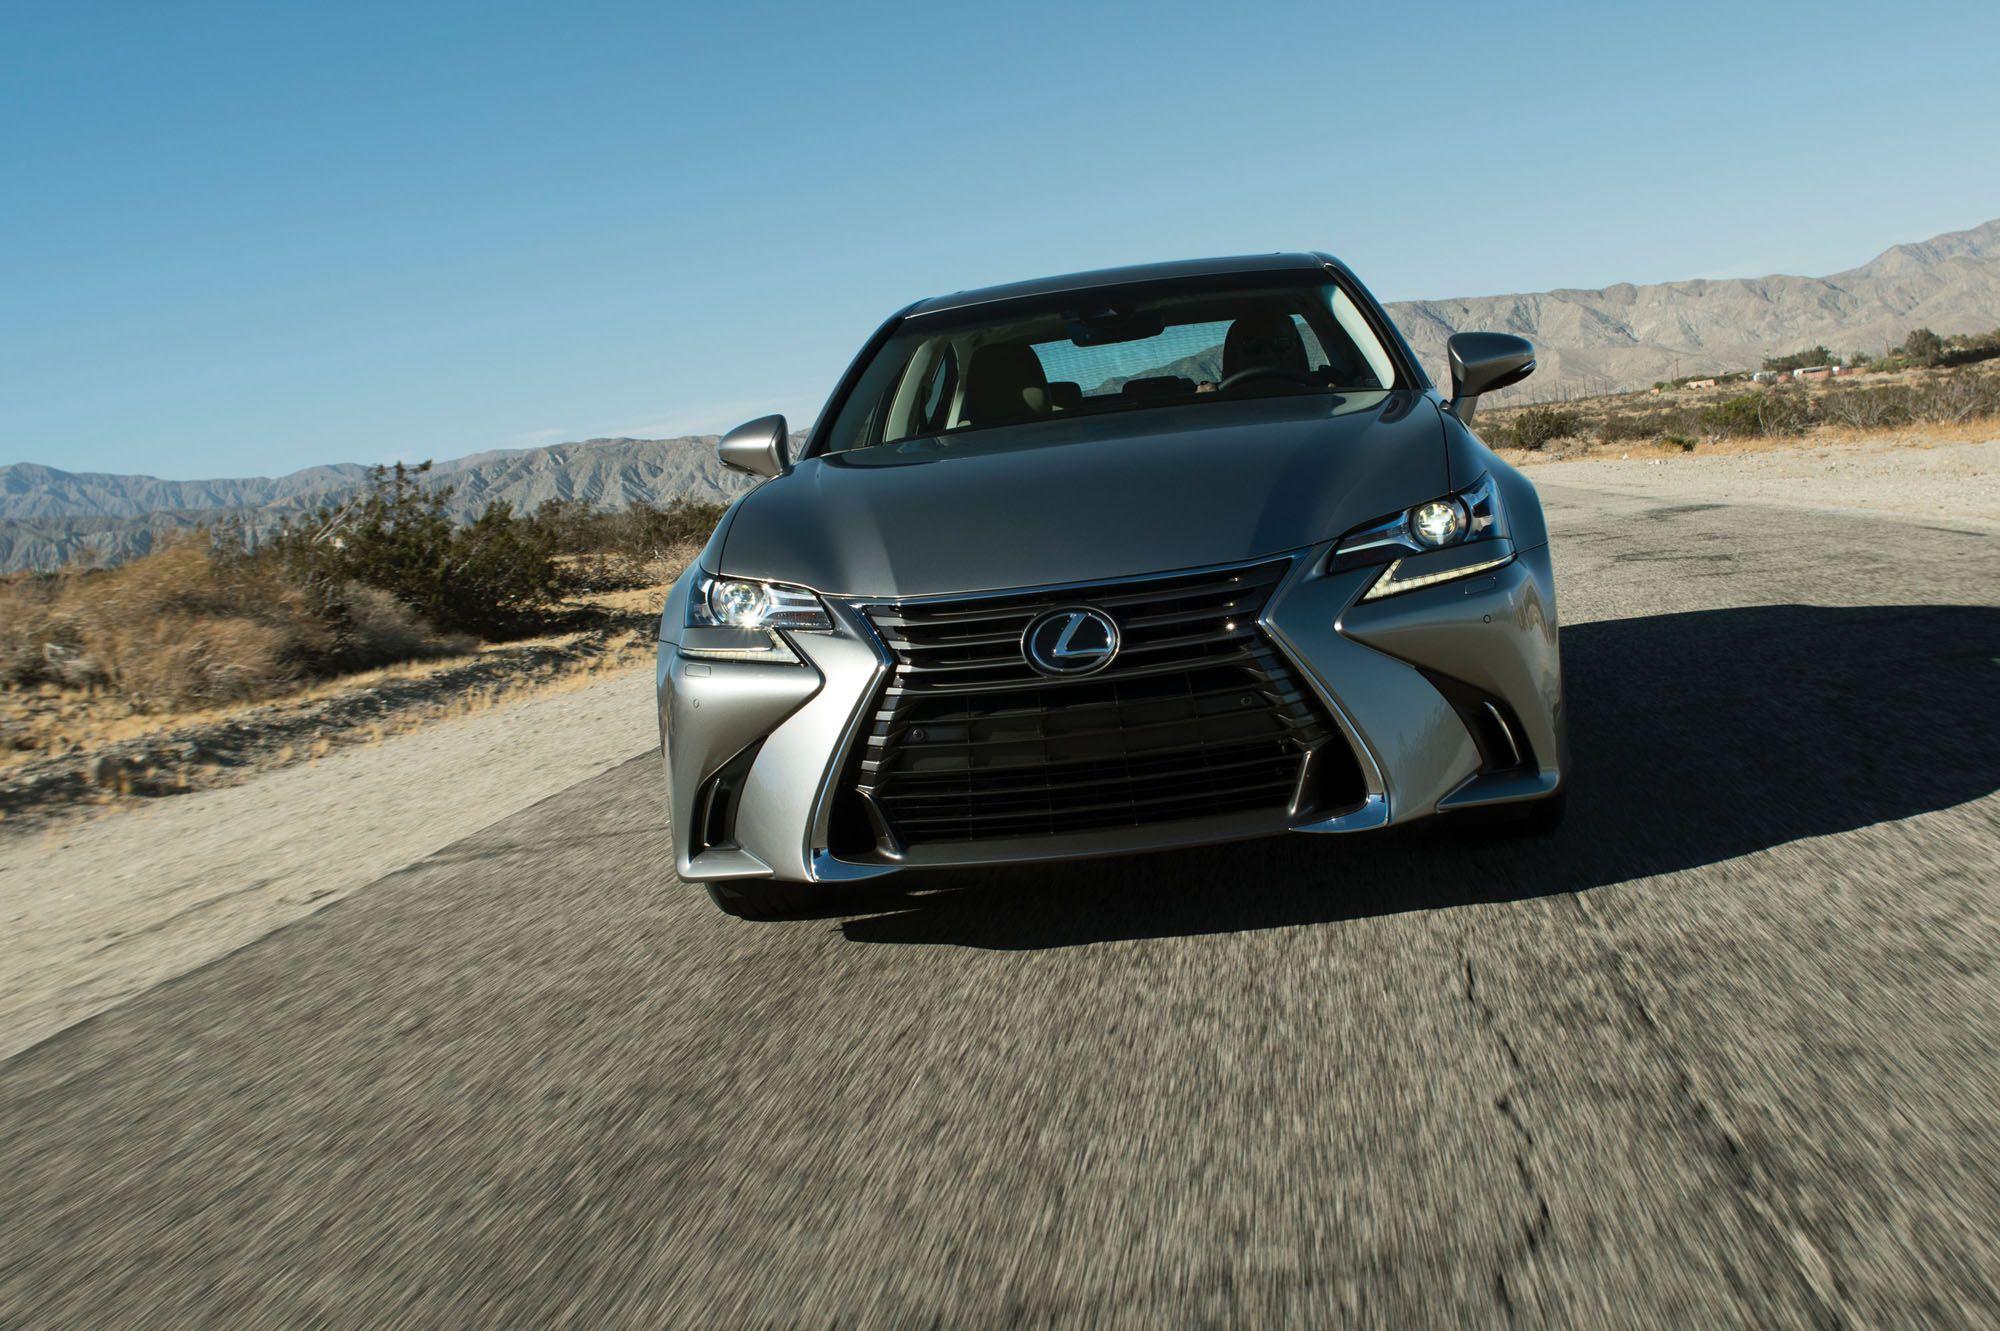 Lexus Revs Up Pebble Beach with Their 2016 LX 570 SUV & Three GS